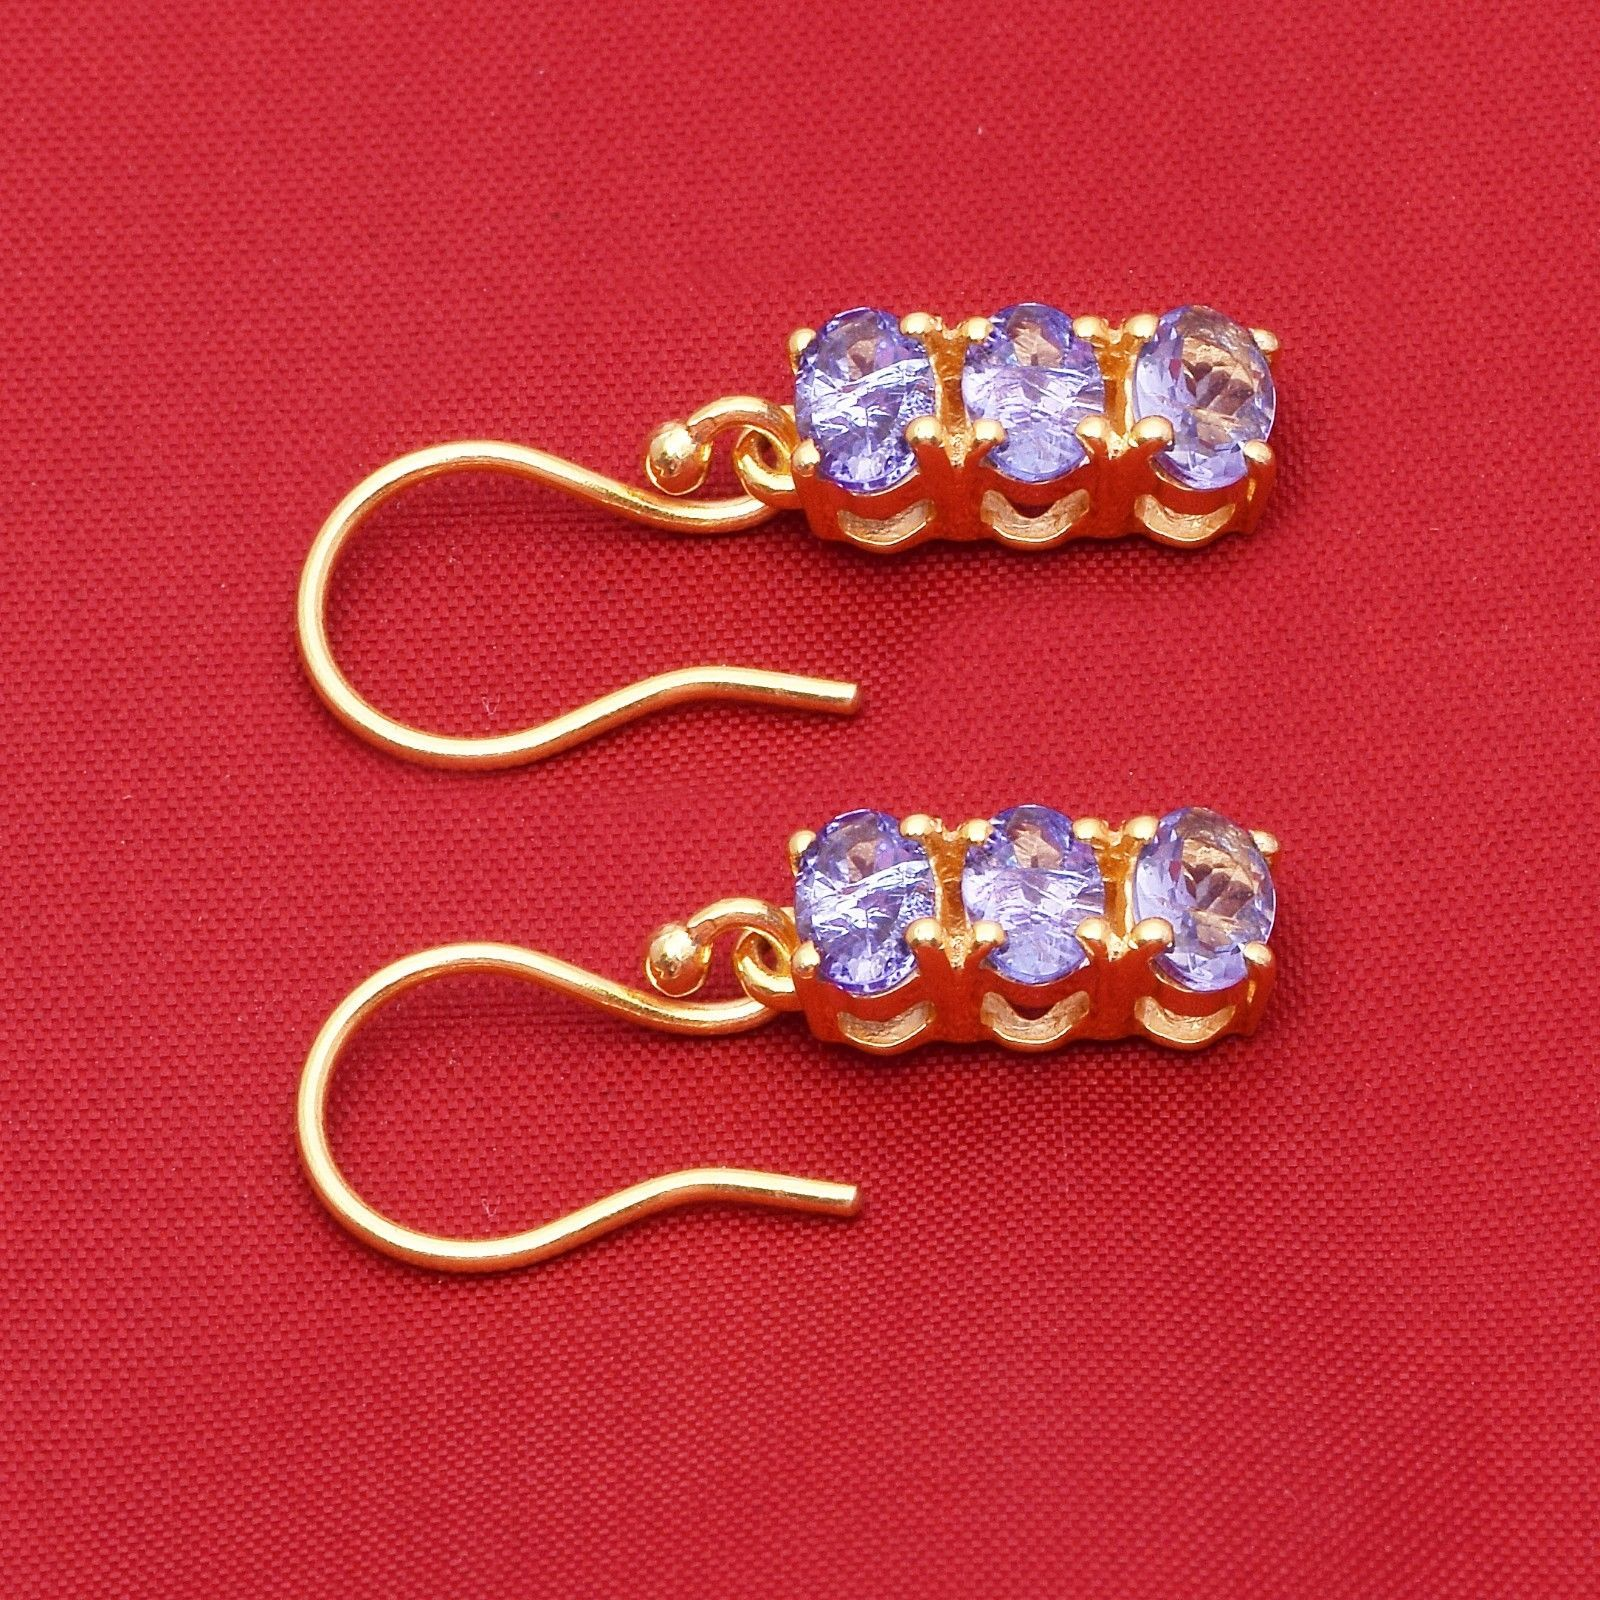 Wonderful Tanzanite Quartz 925 Sterling Silver Earring Shine Jewelry SHER0795